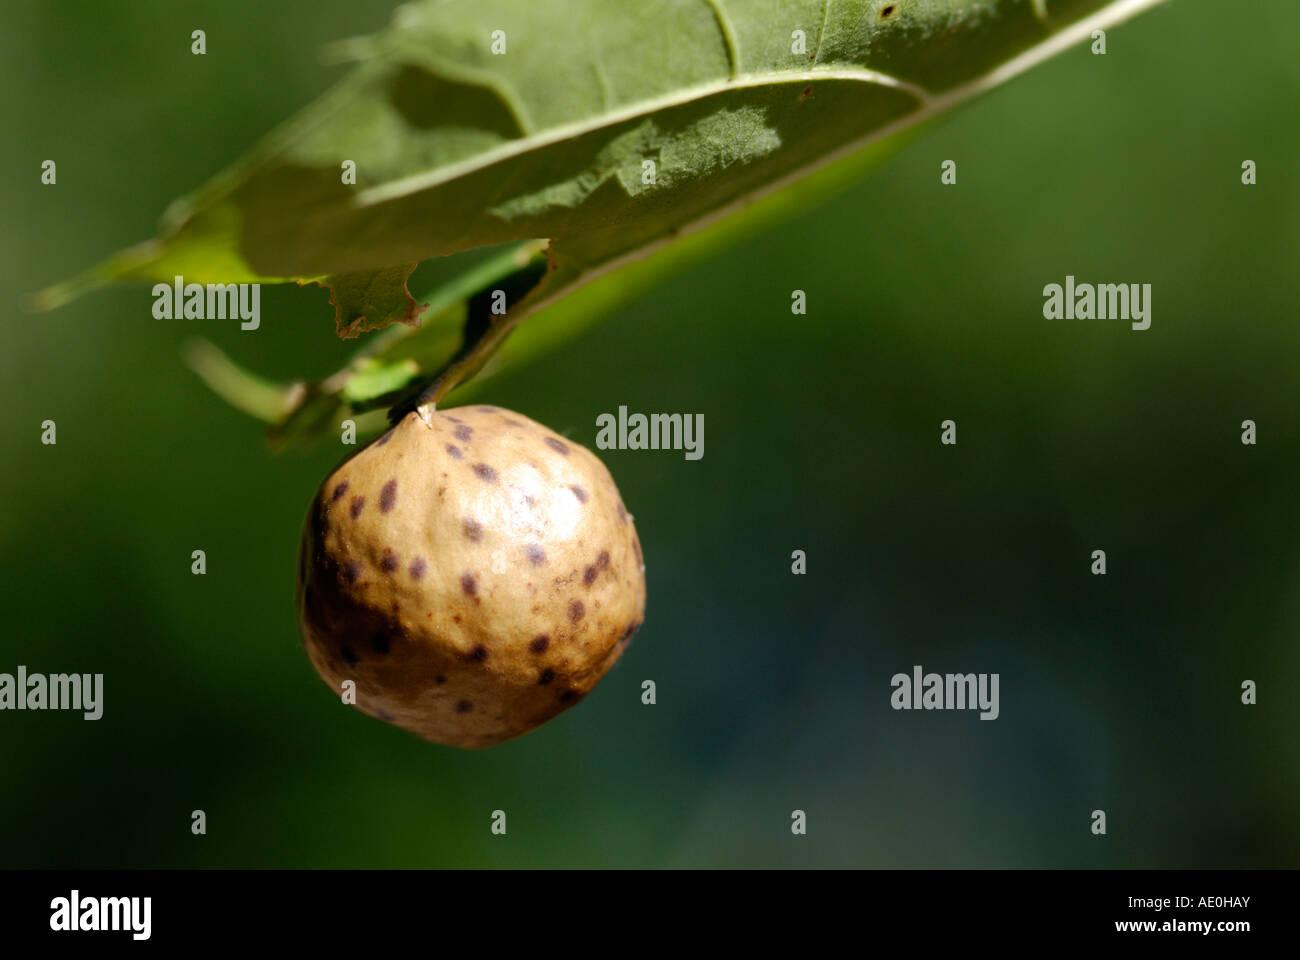 Oak apple gall - Stock Image